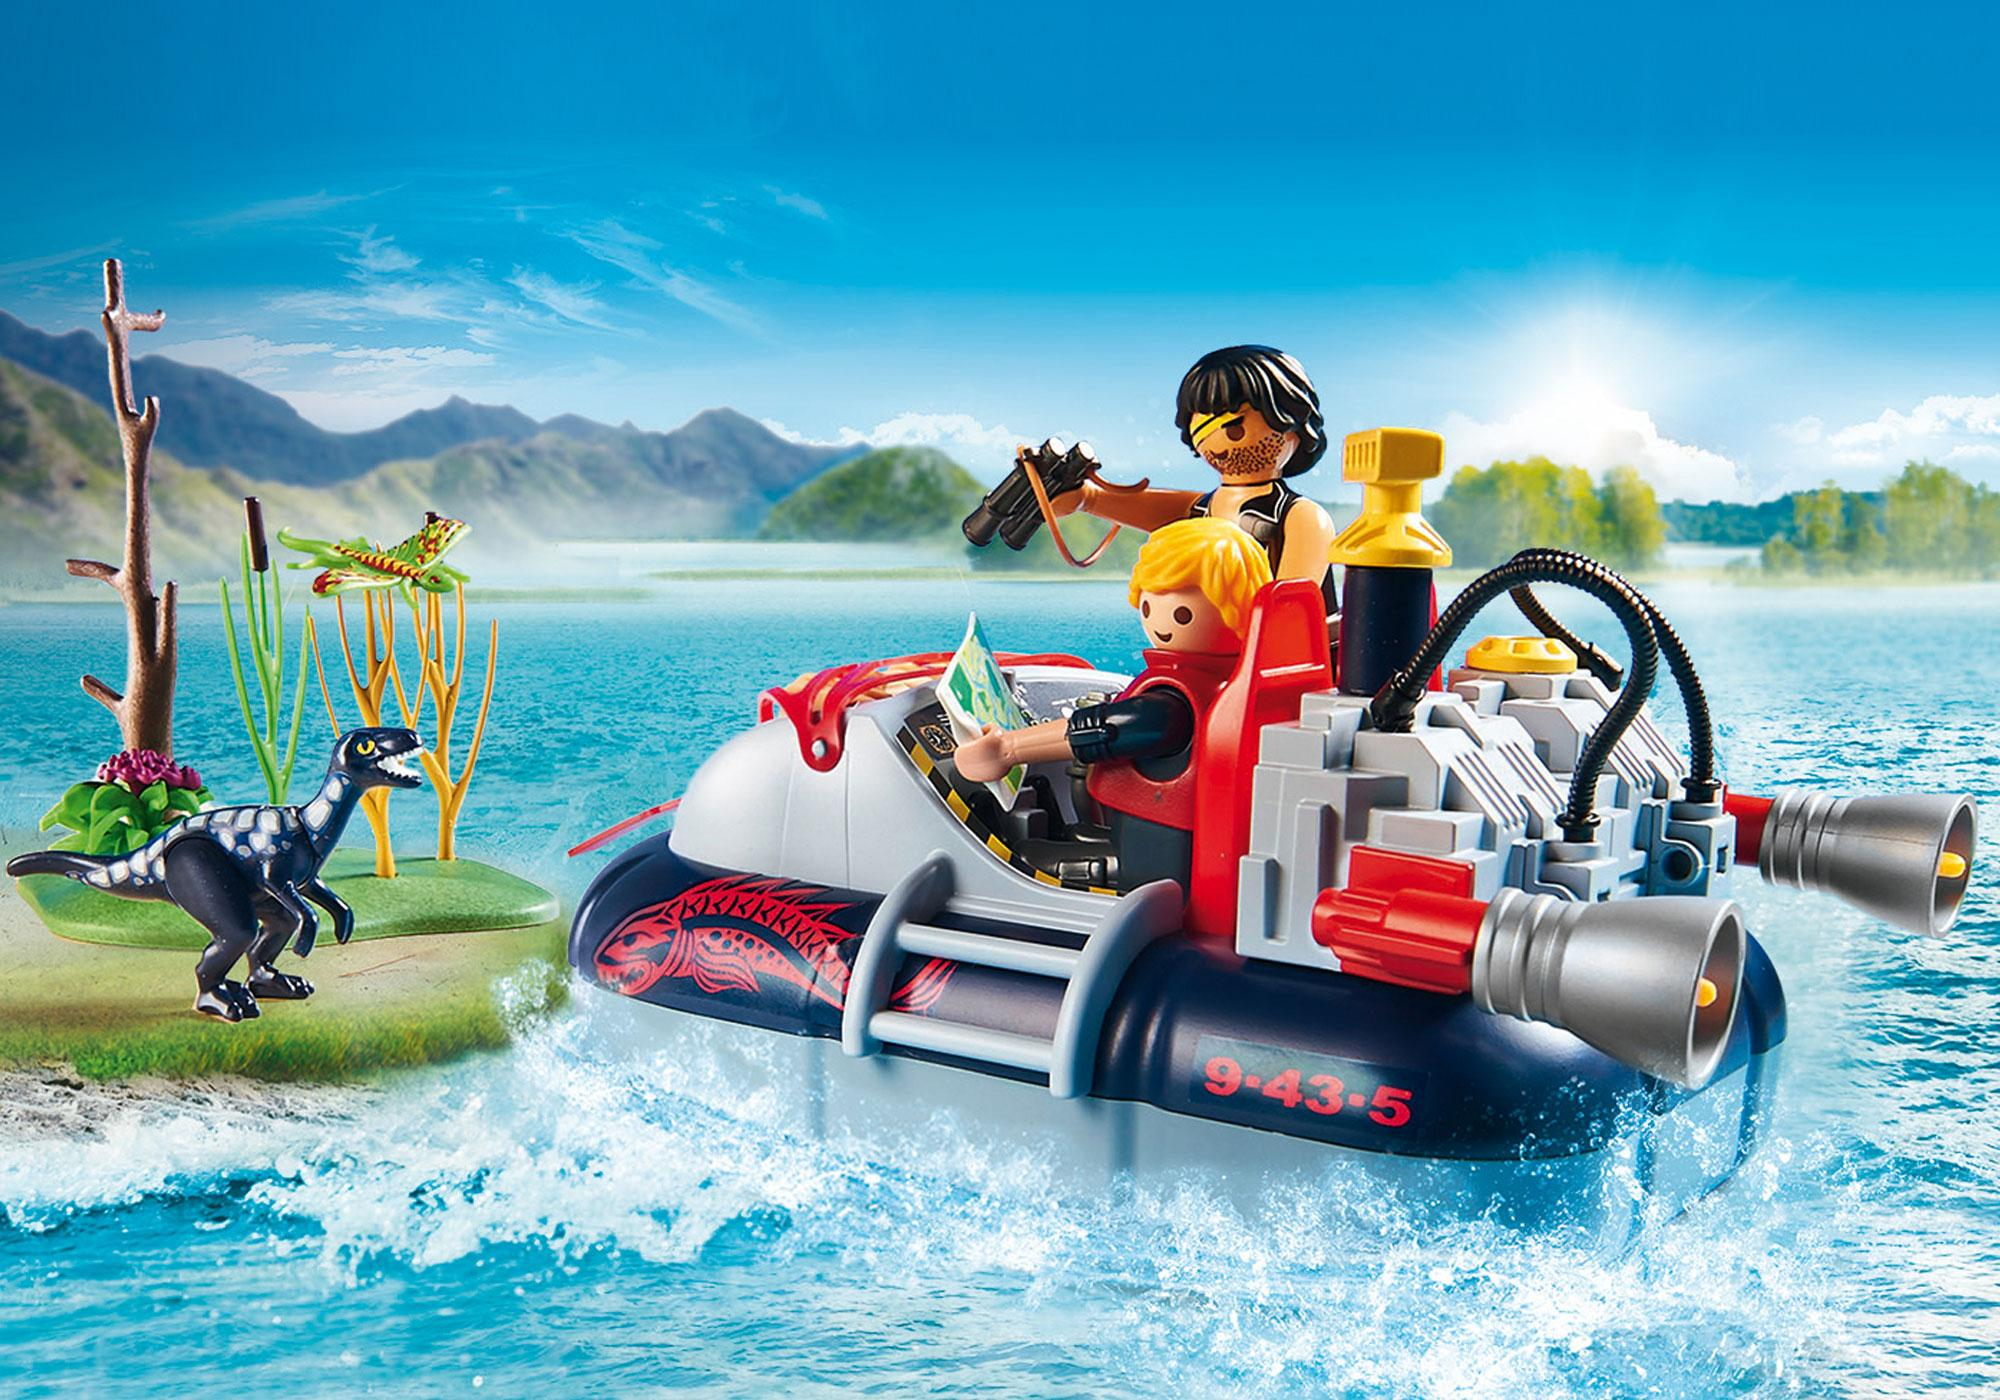 http://media.playmobil.com/i/playmobil/9435_product_extra3/Dino Hovercraft with Underwater Motor